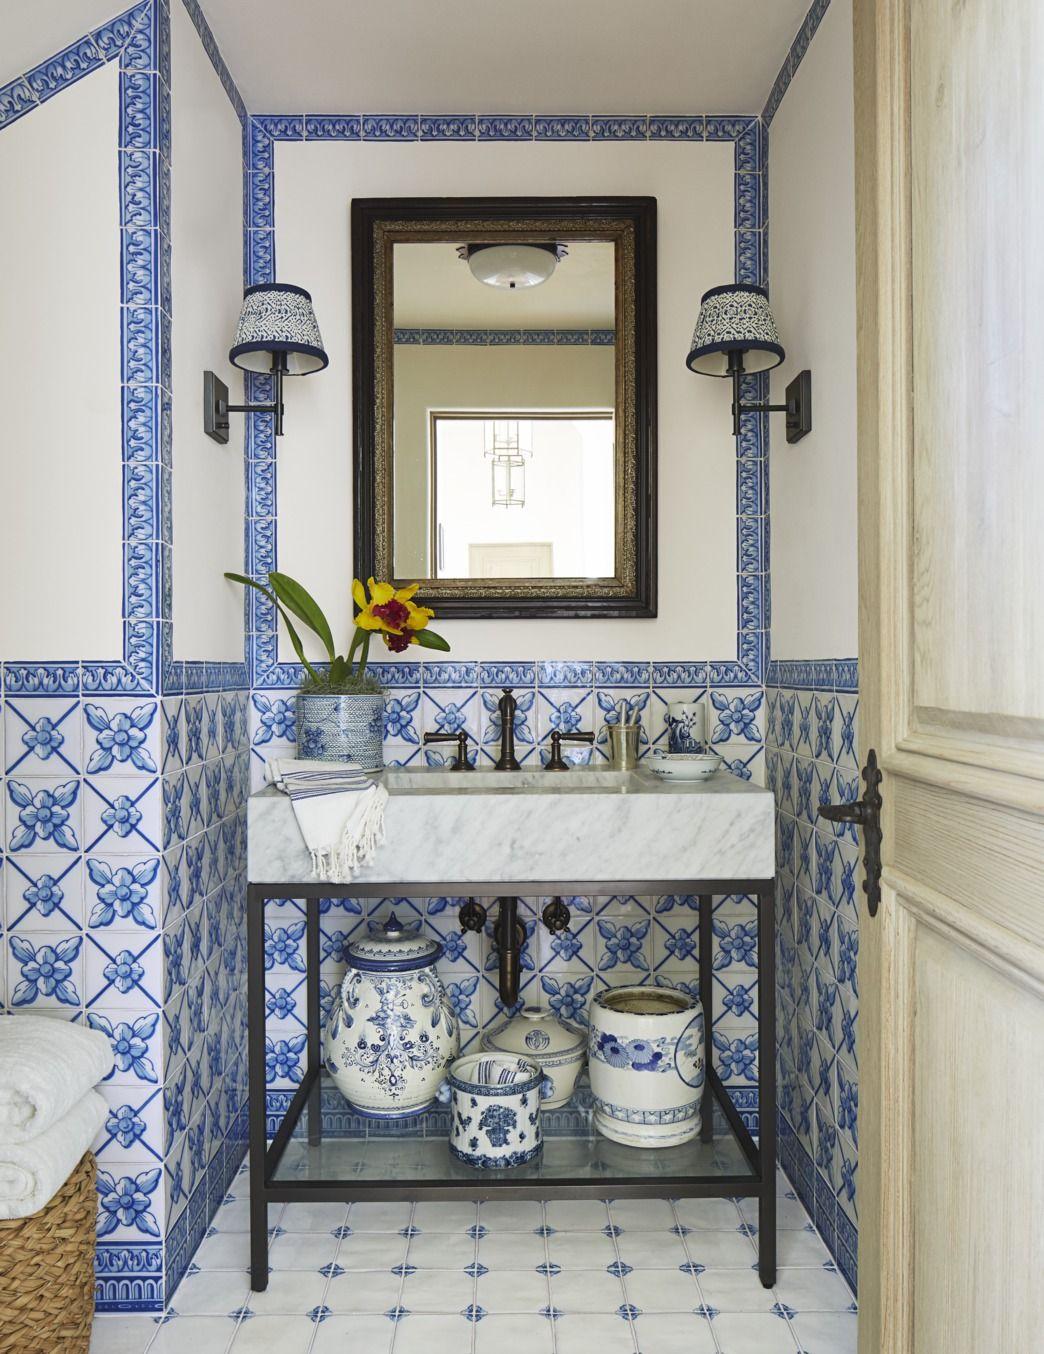 15 Bathroom Tile Decorating Ideas